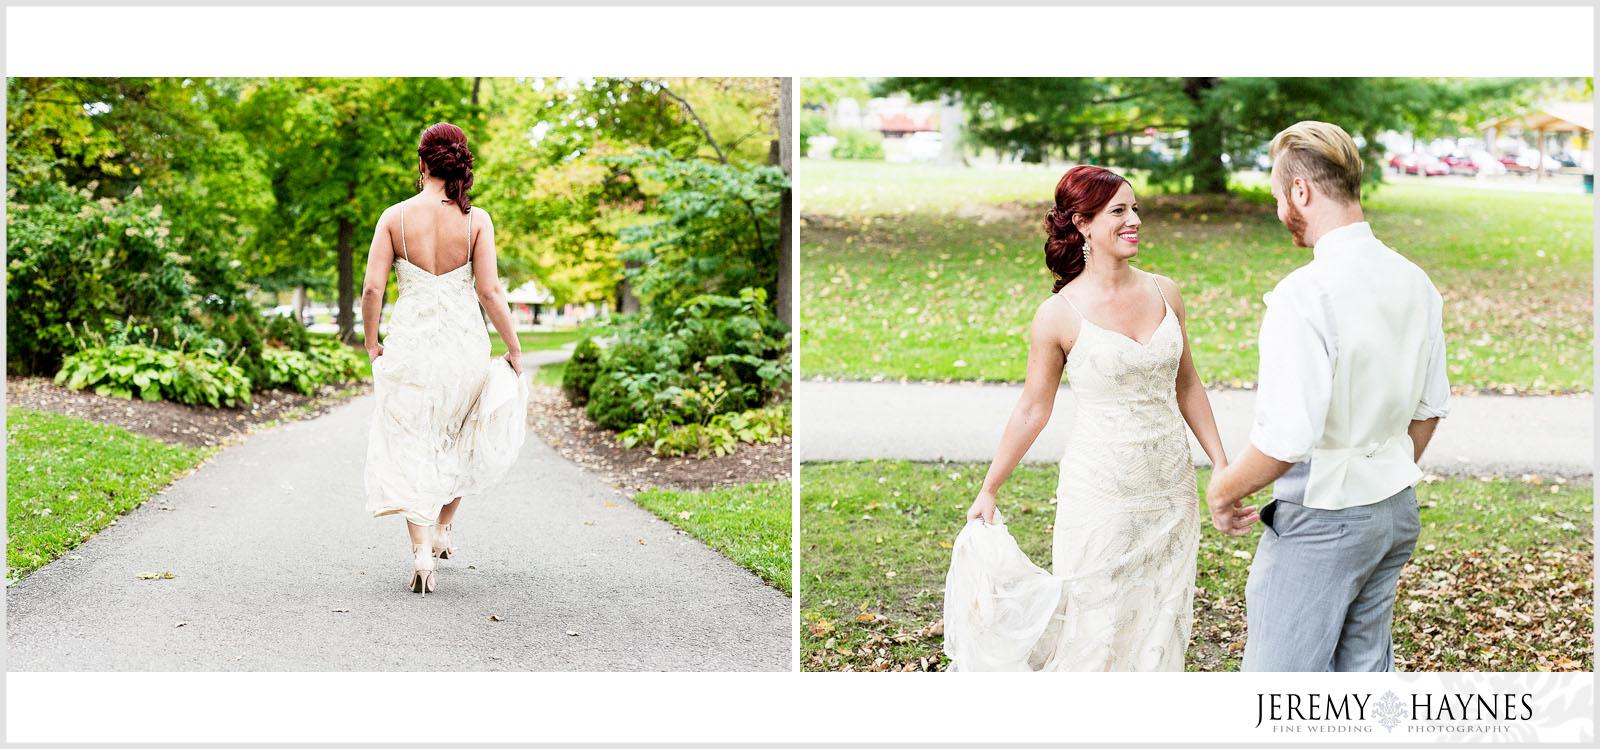 04-forest-park-indianapolis-transportation-museum-noblesville-wedding-photographer.jpg